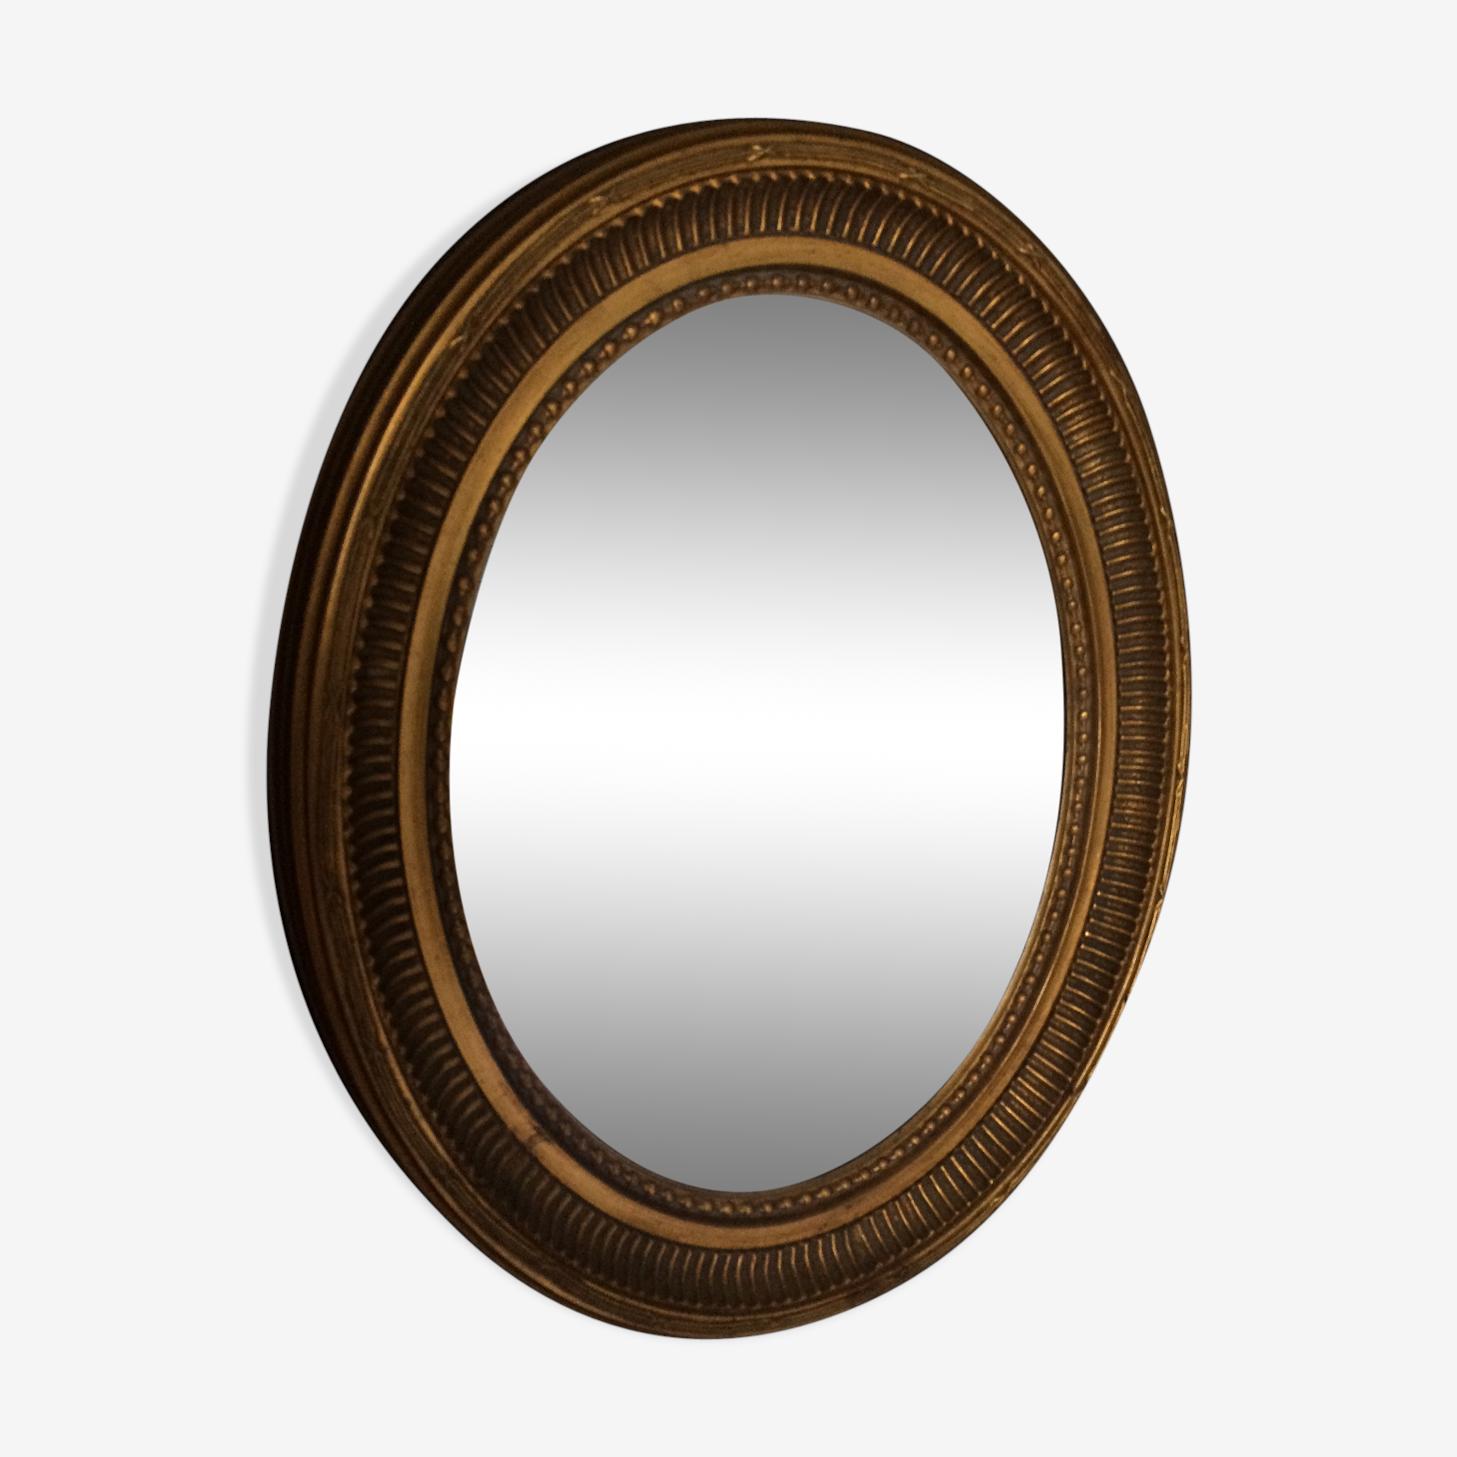 Antique mirror oval gilded 50x40cm